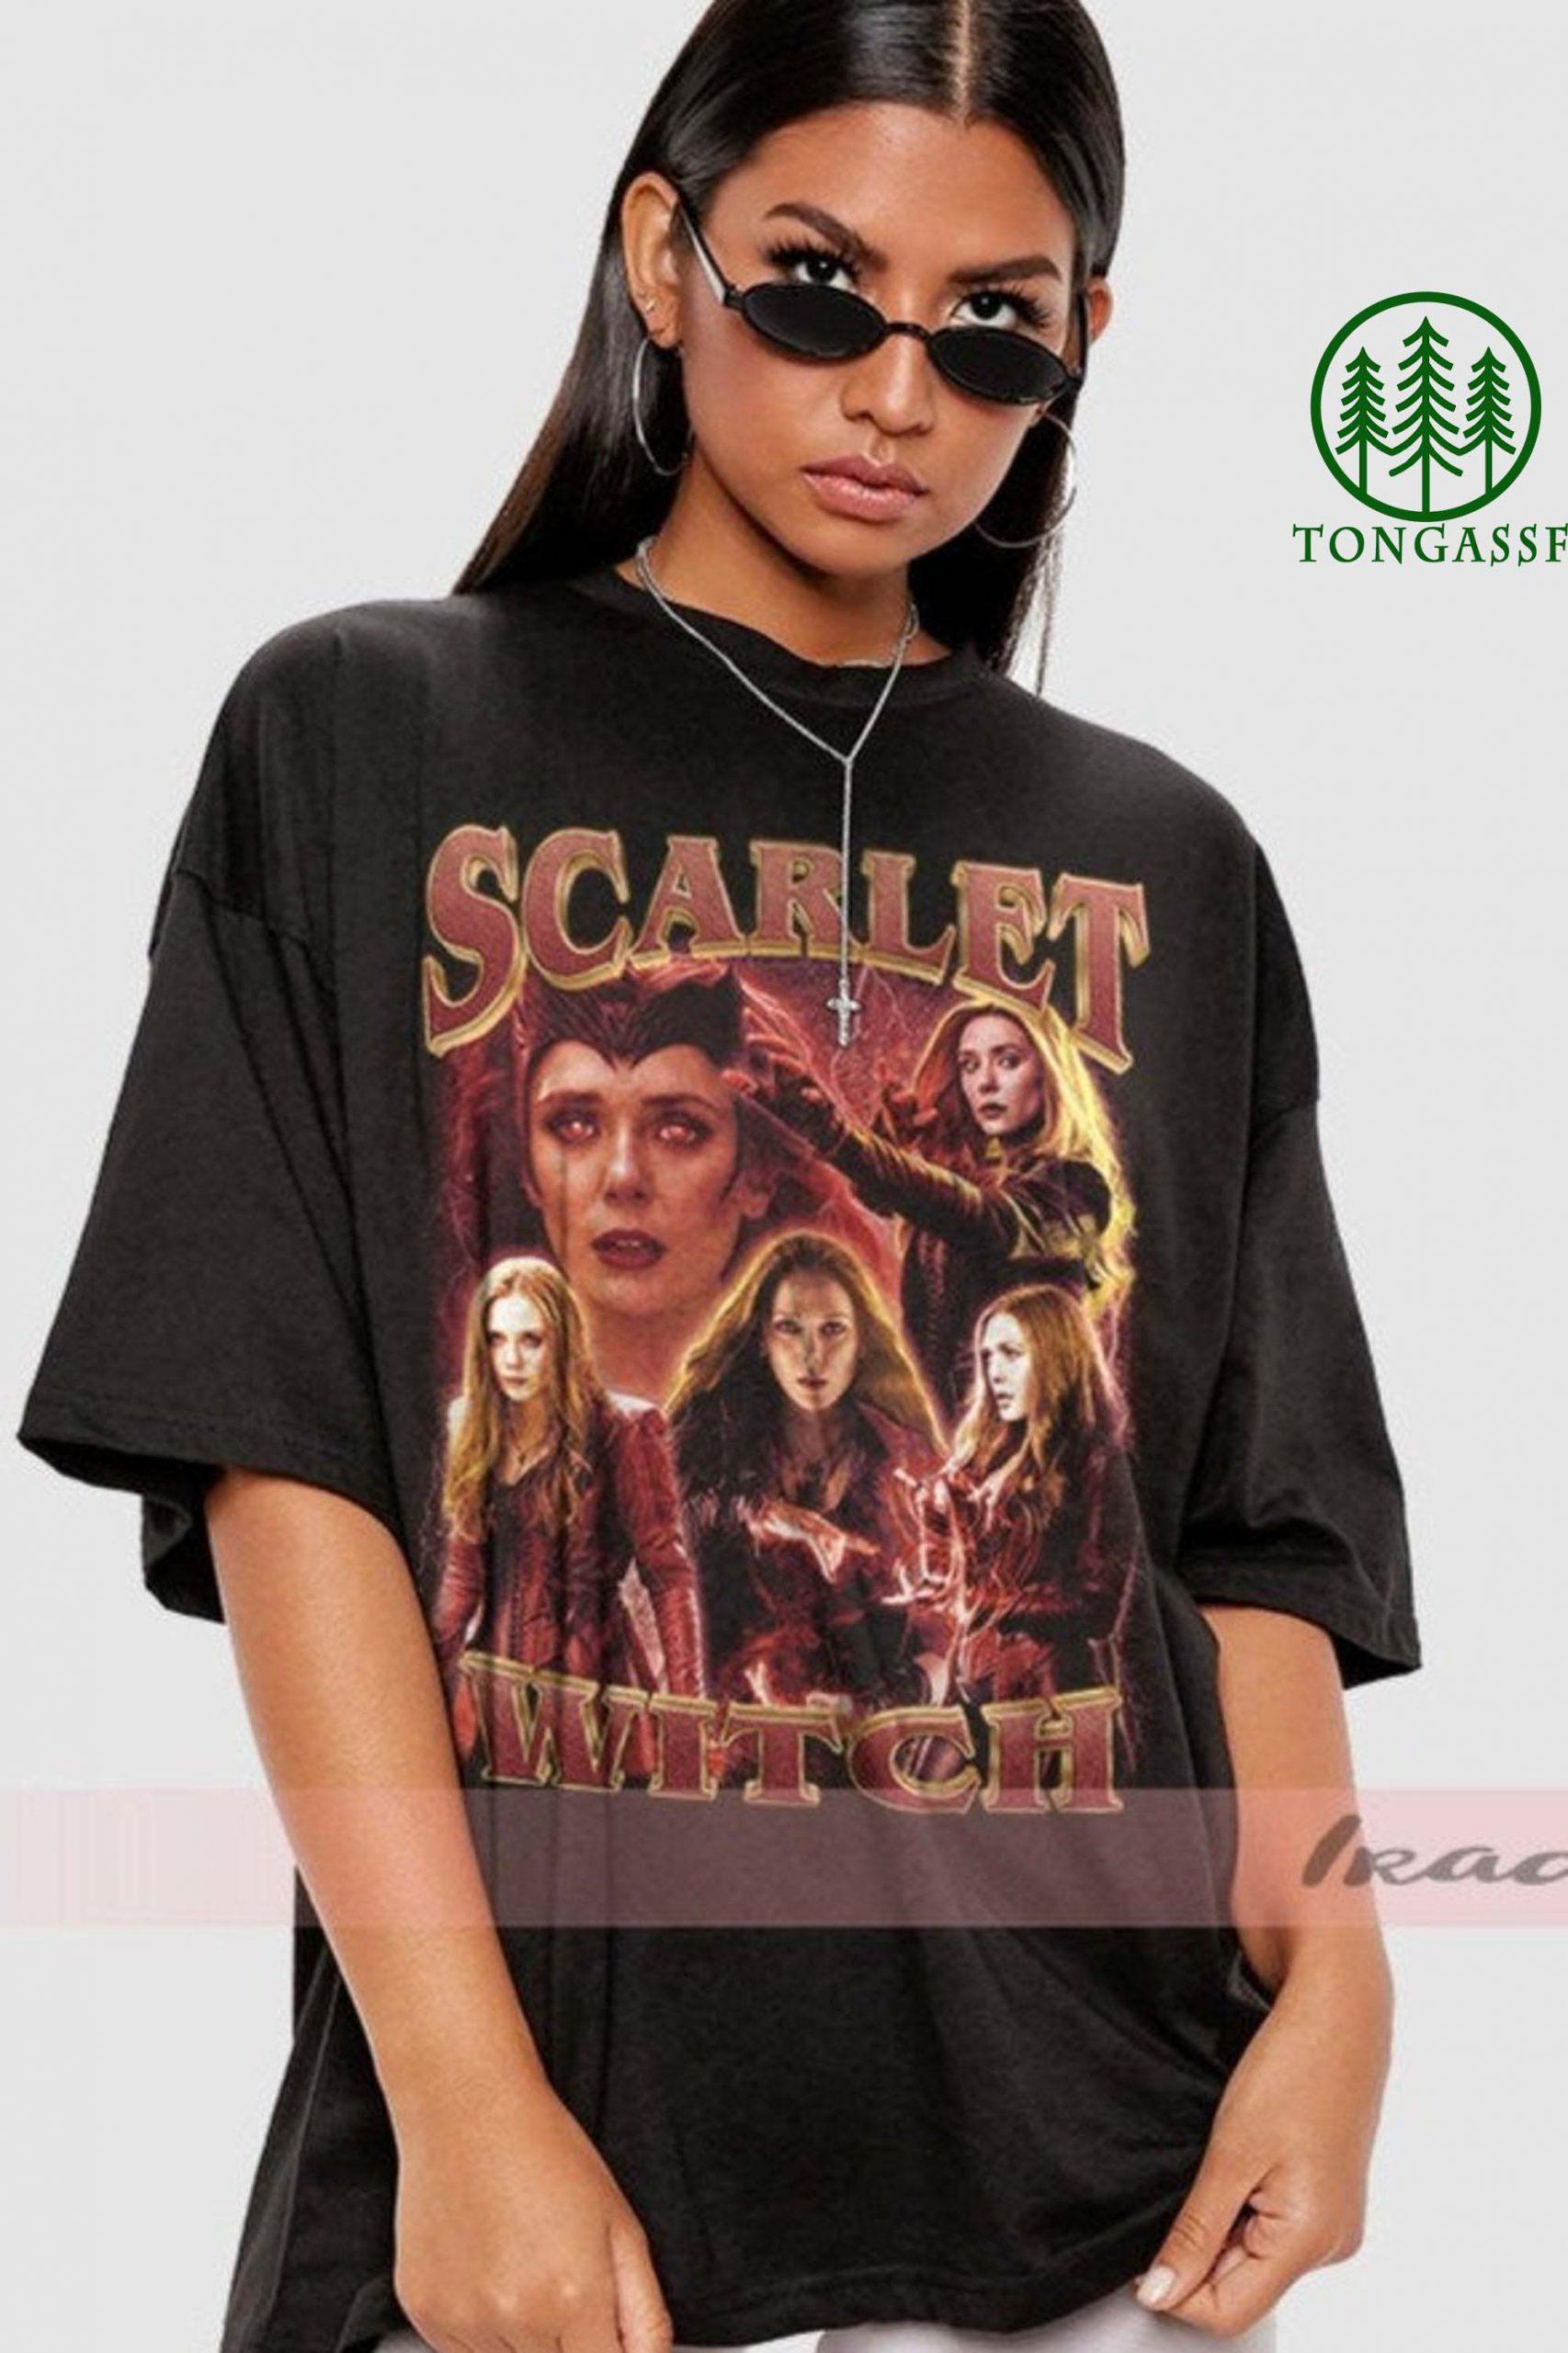 Scarlet Witch Wanda Vision Elizabeth Olsen Shirt